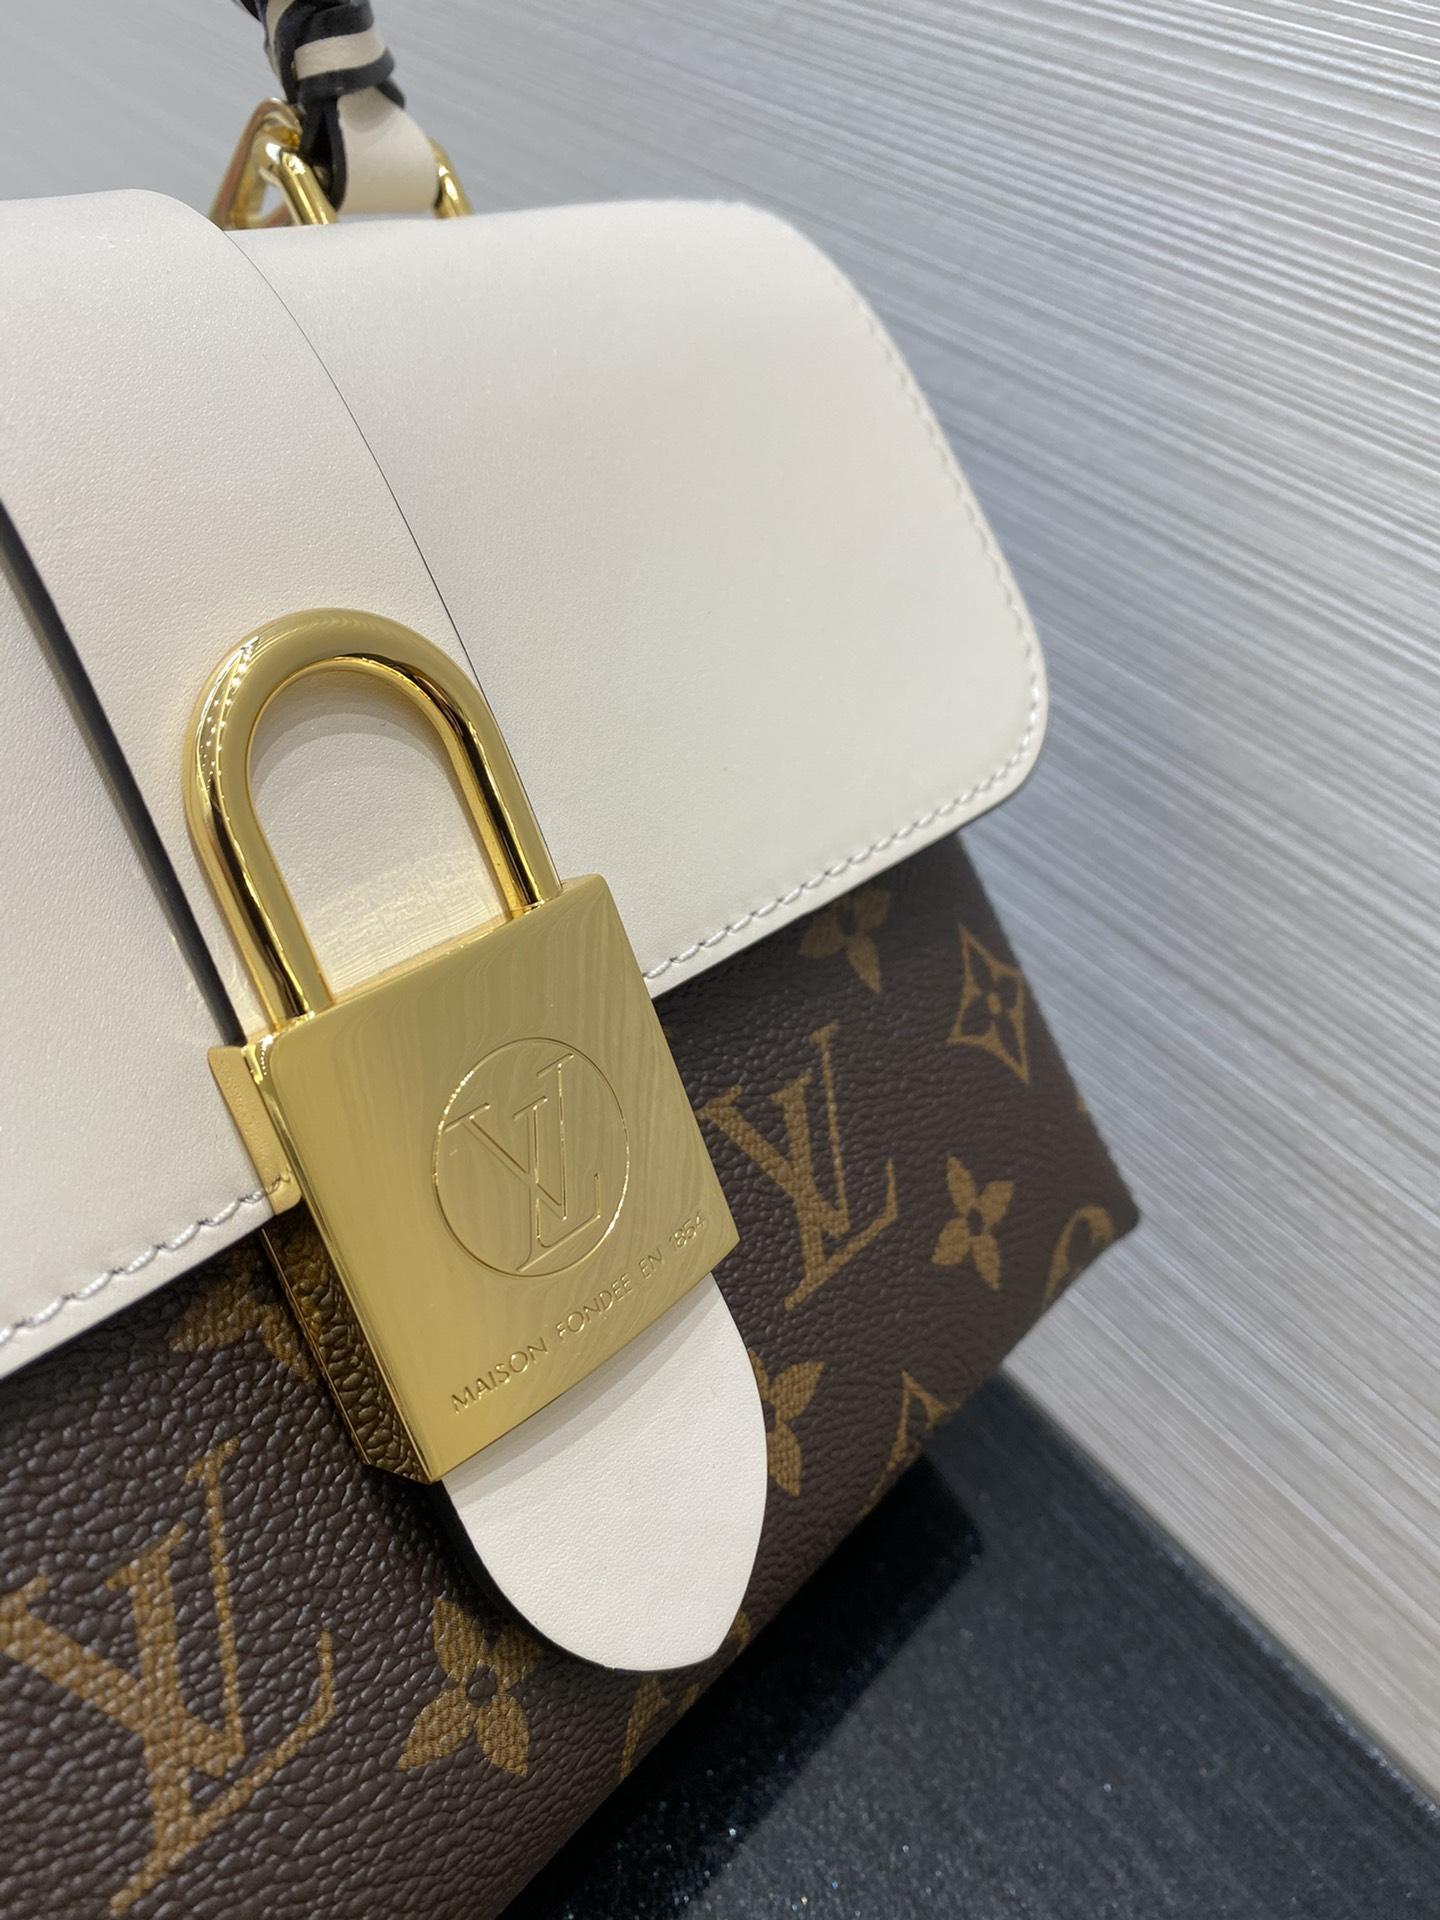 【¥800】LV包包批发 最新Locky小邮差包44321 很有质感的五金锁 复古又耐看